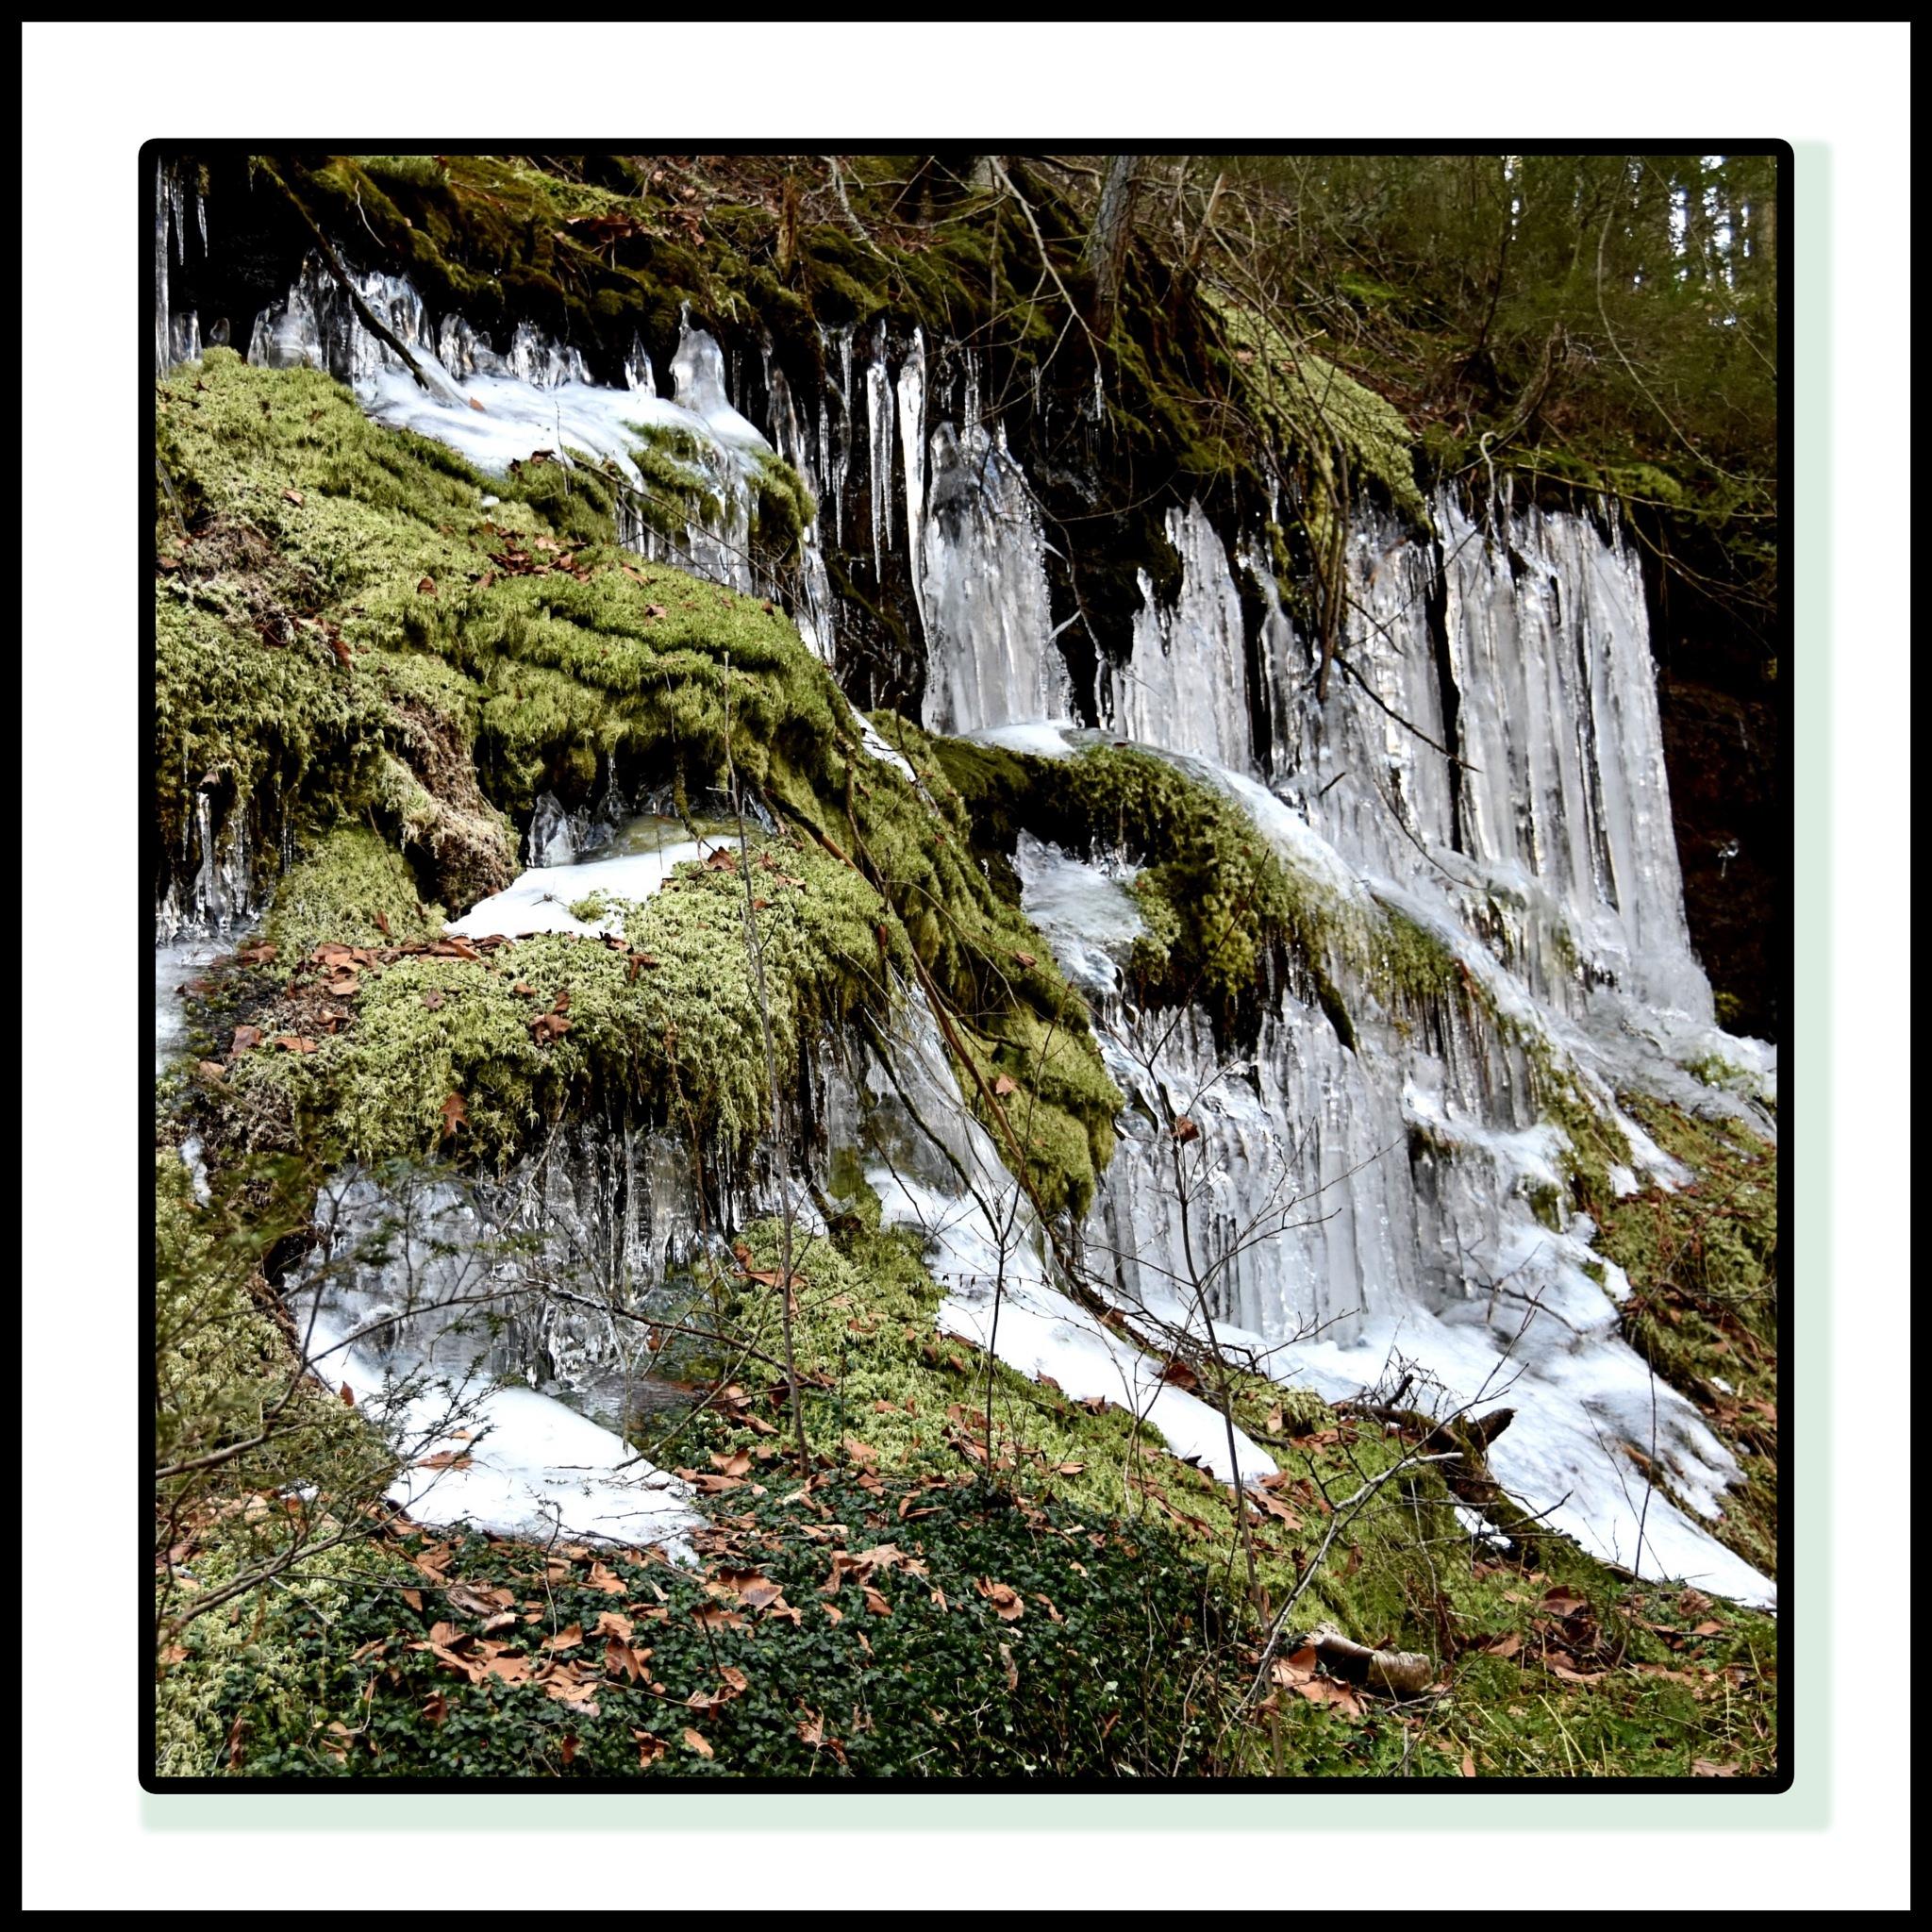 Winter Ice by Joeski